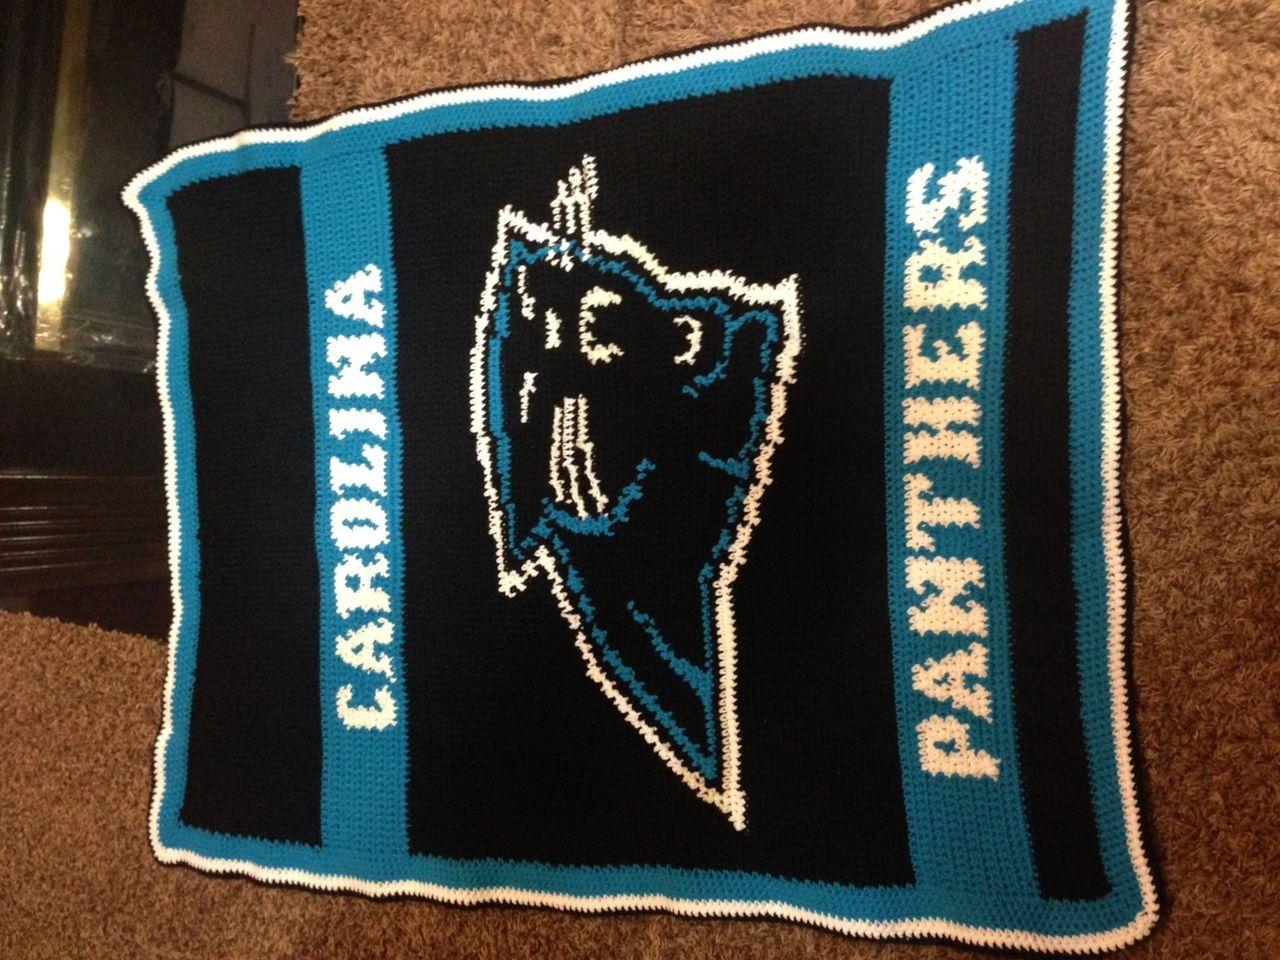 Carolina Panthers Logo Crochet Afghan Graph Pattern Downloadable By Tashiab Basic Granny Square Stitch Diagram Citiusa